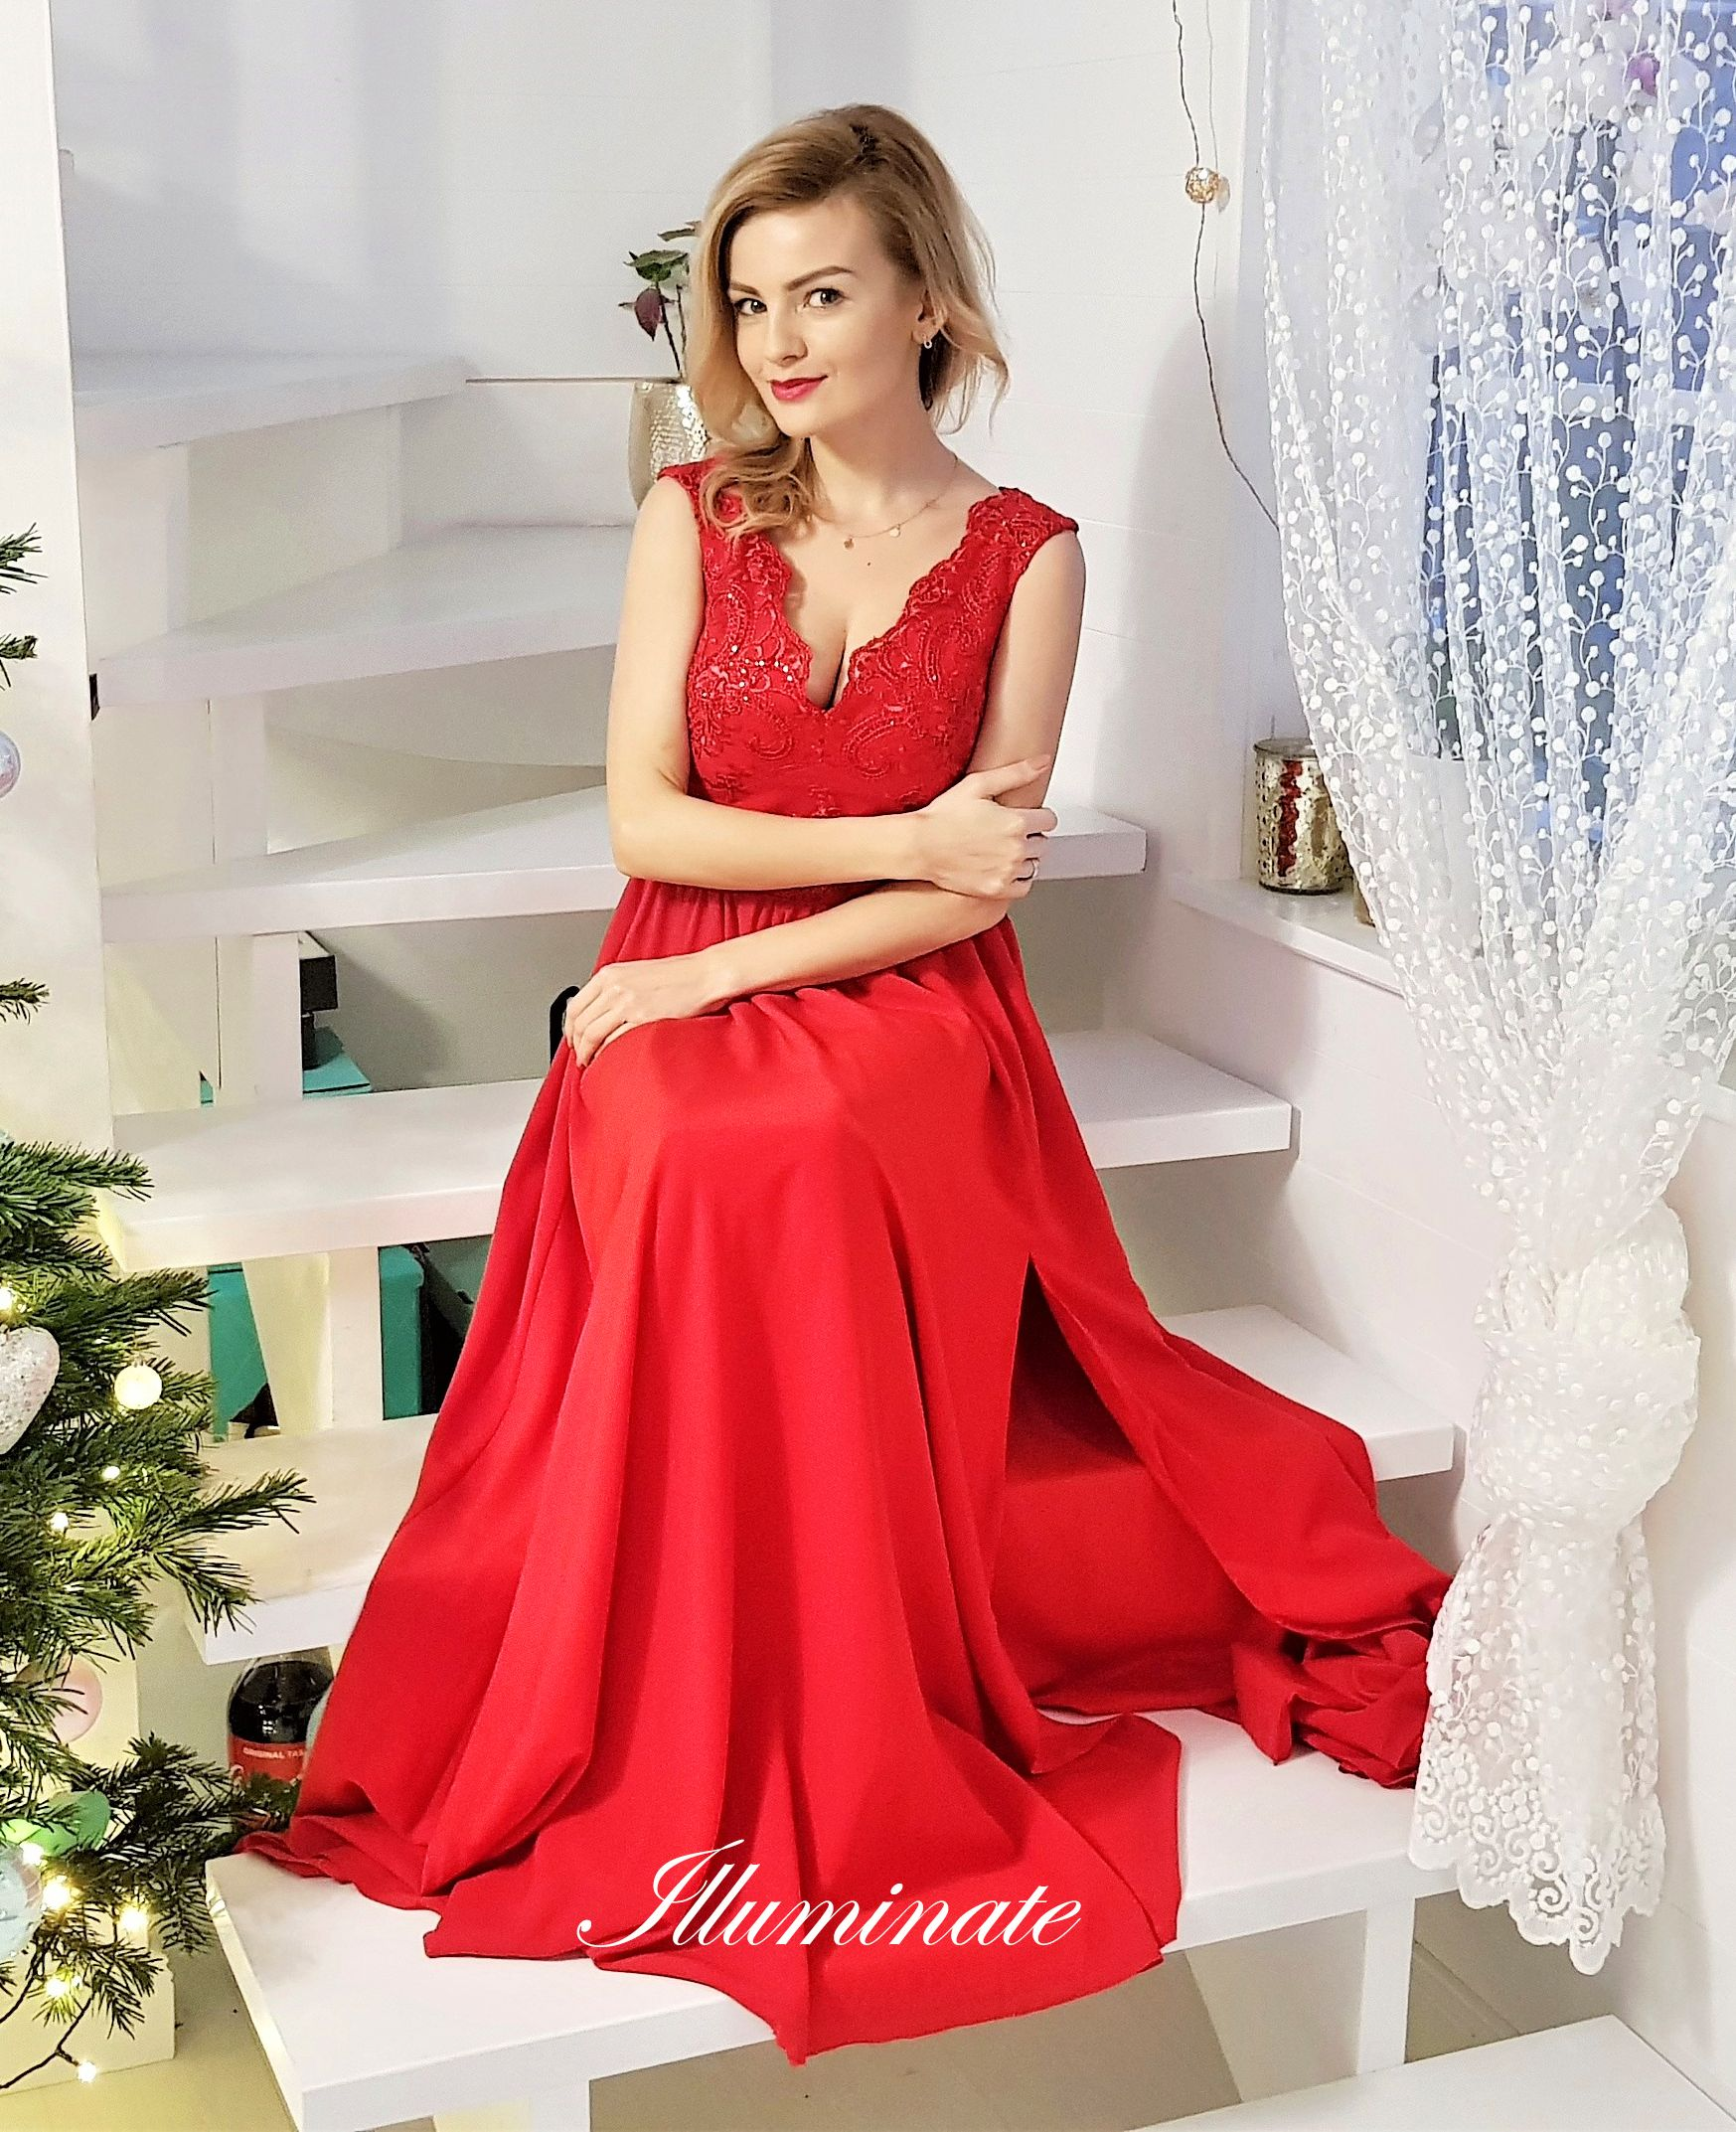 6502392c19 Maxi red dress Julia - gt  illuminate.pl Piękna długa czerwona suknia na  studniówkę